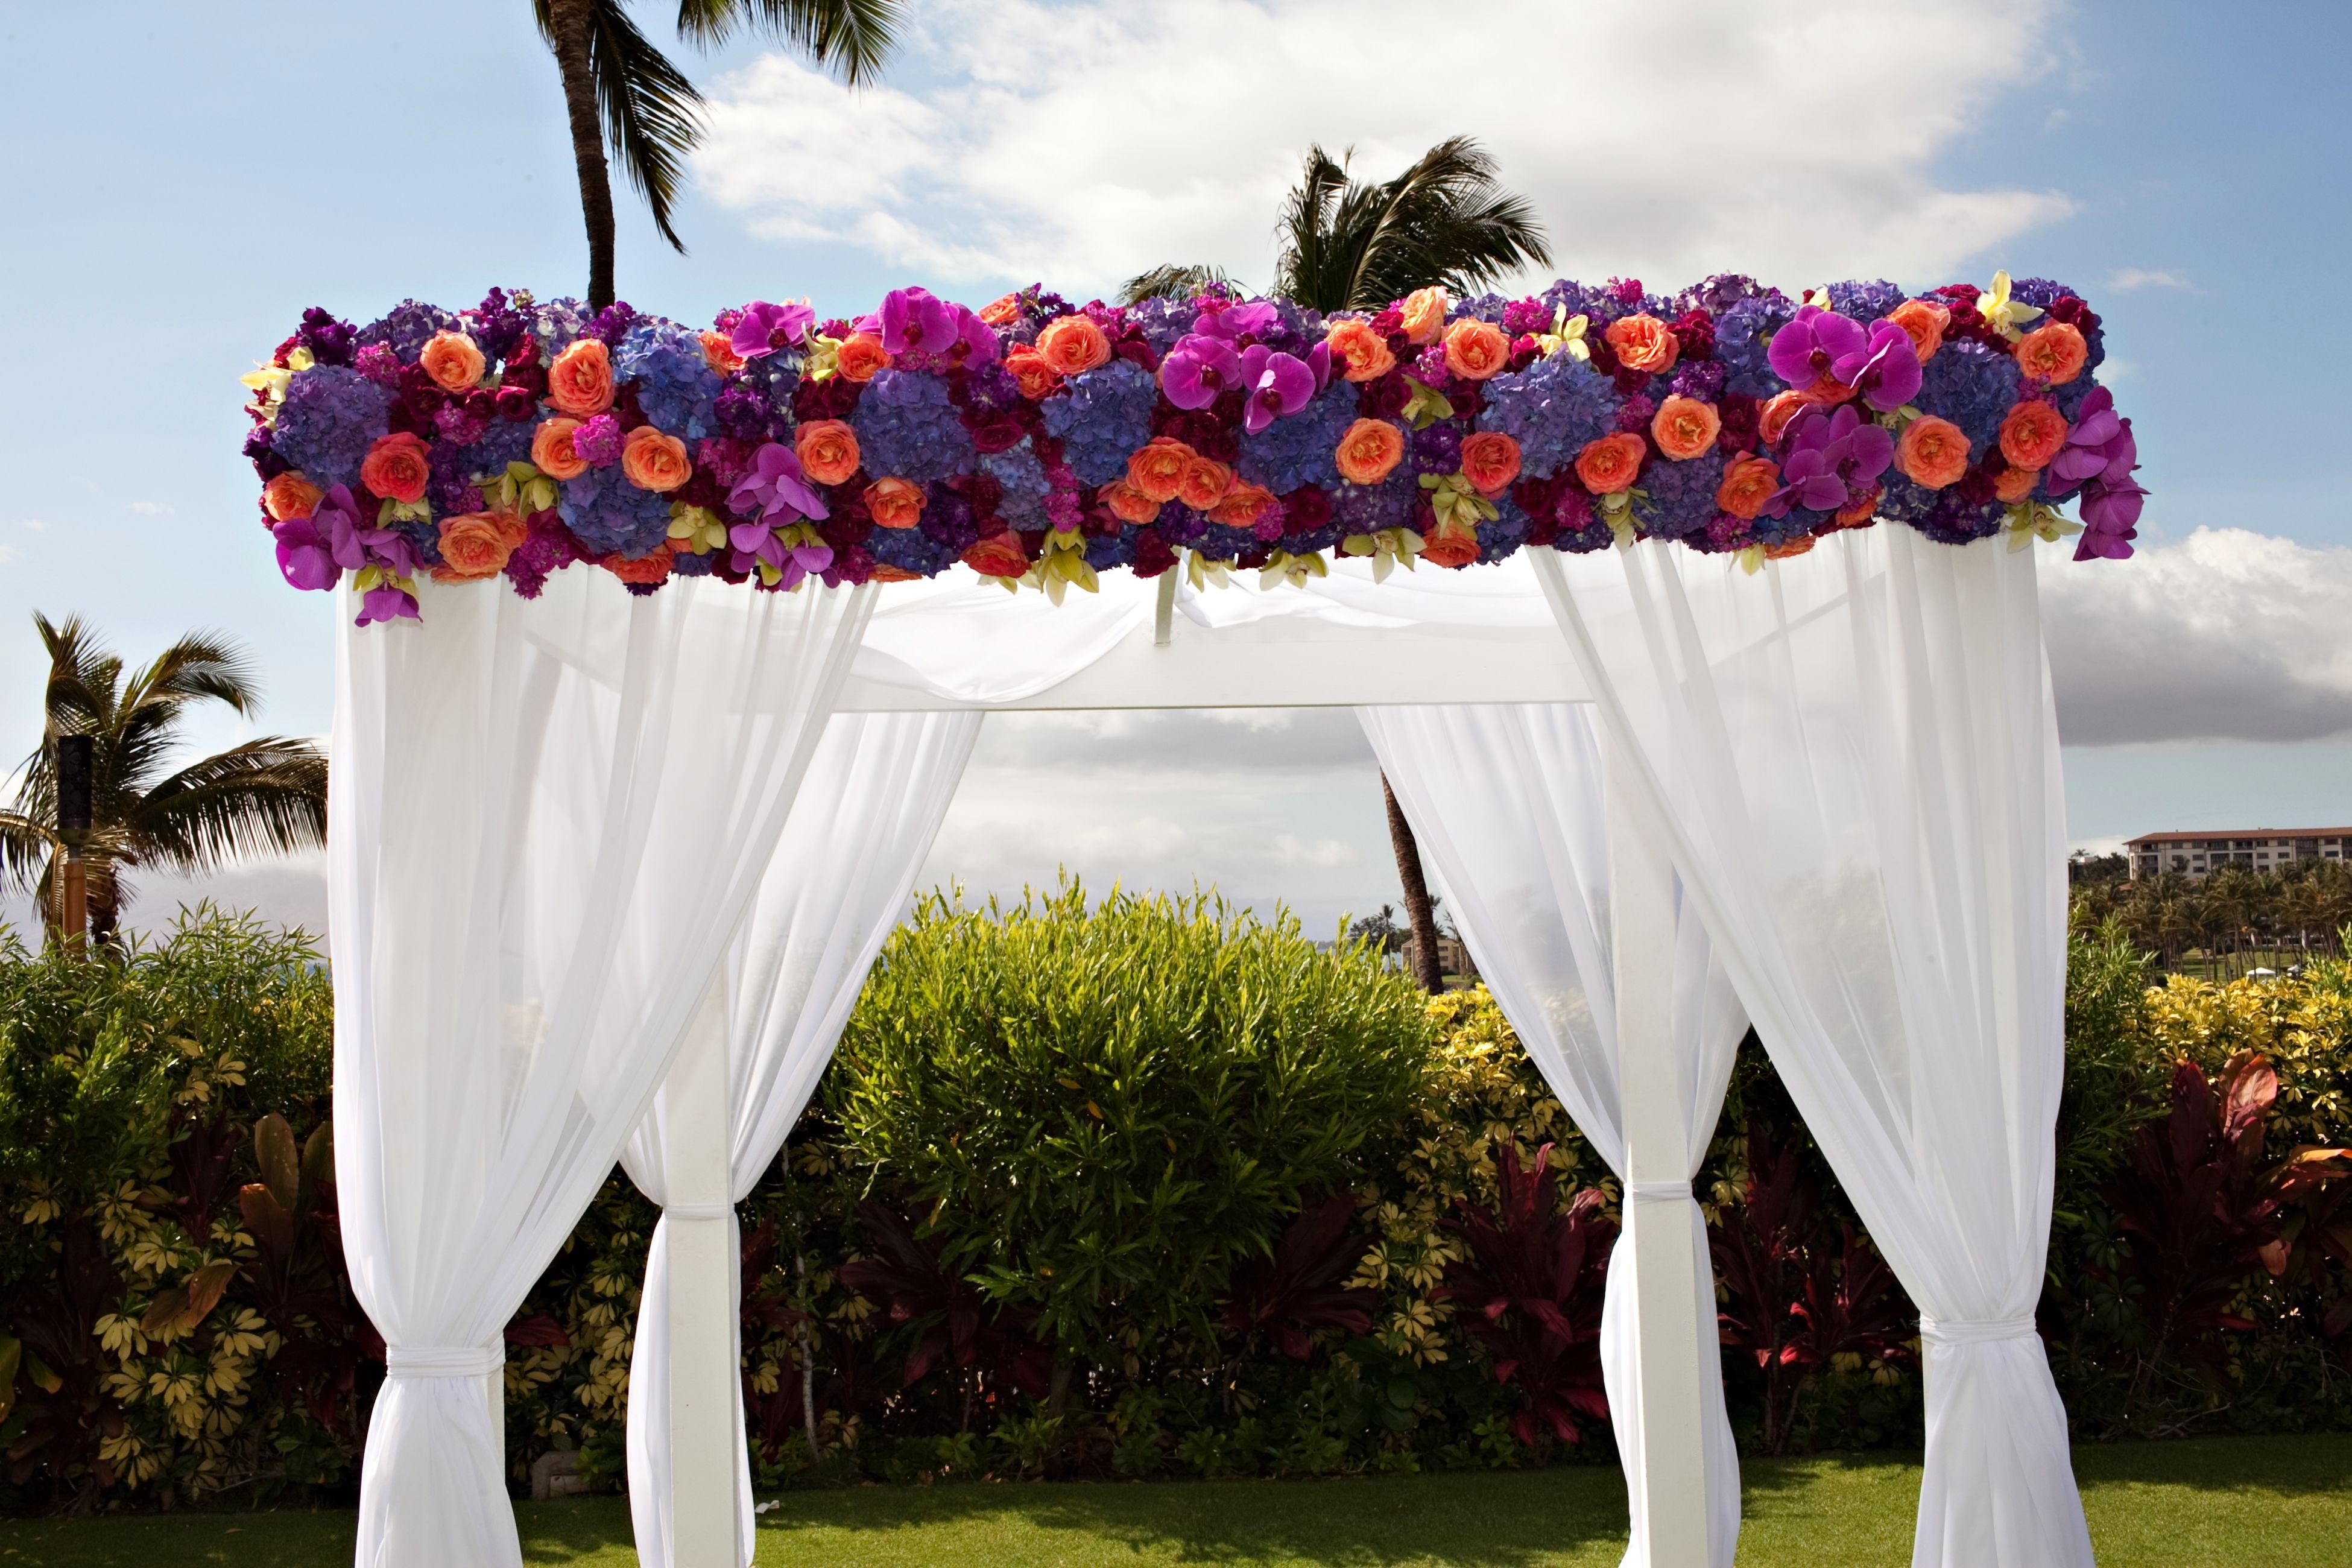 Wedding Canopy Flowers Wedding Canopy Flowers Wedding Canopy Decorations Wedding Canopy